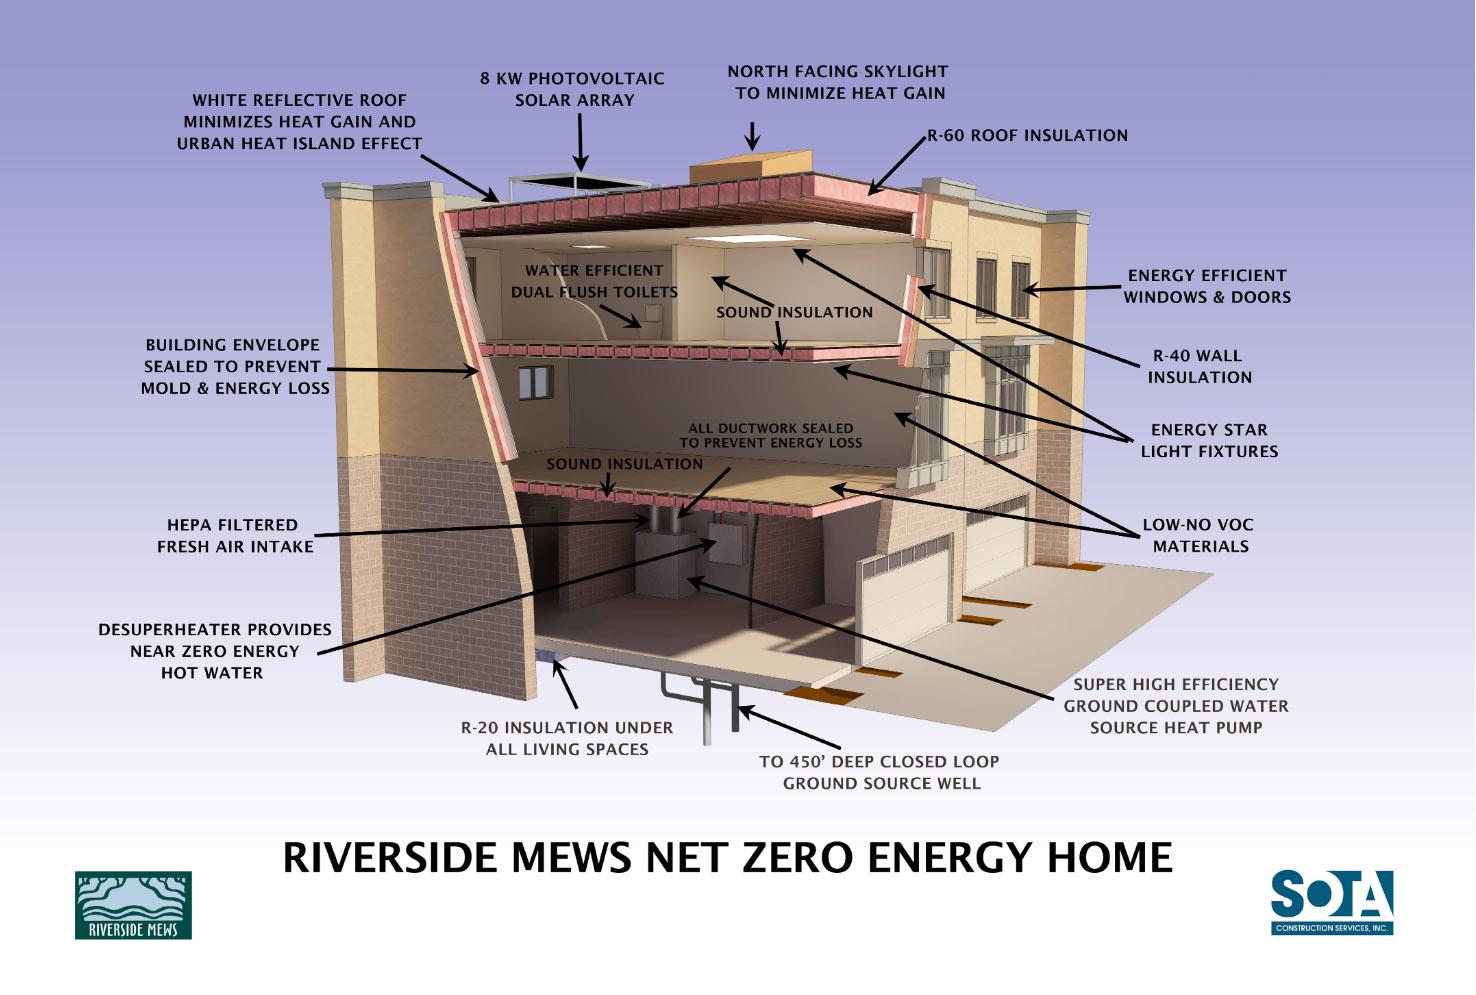 Riverside Mews Net Zero